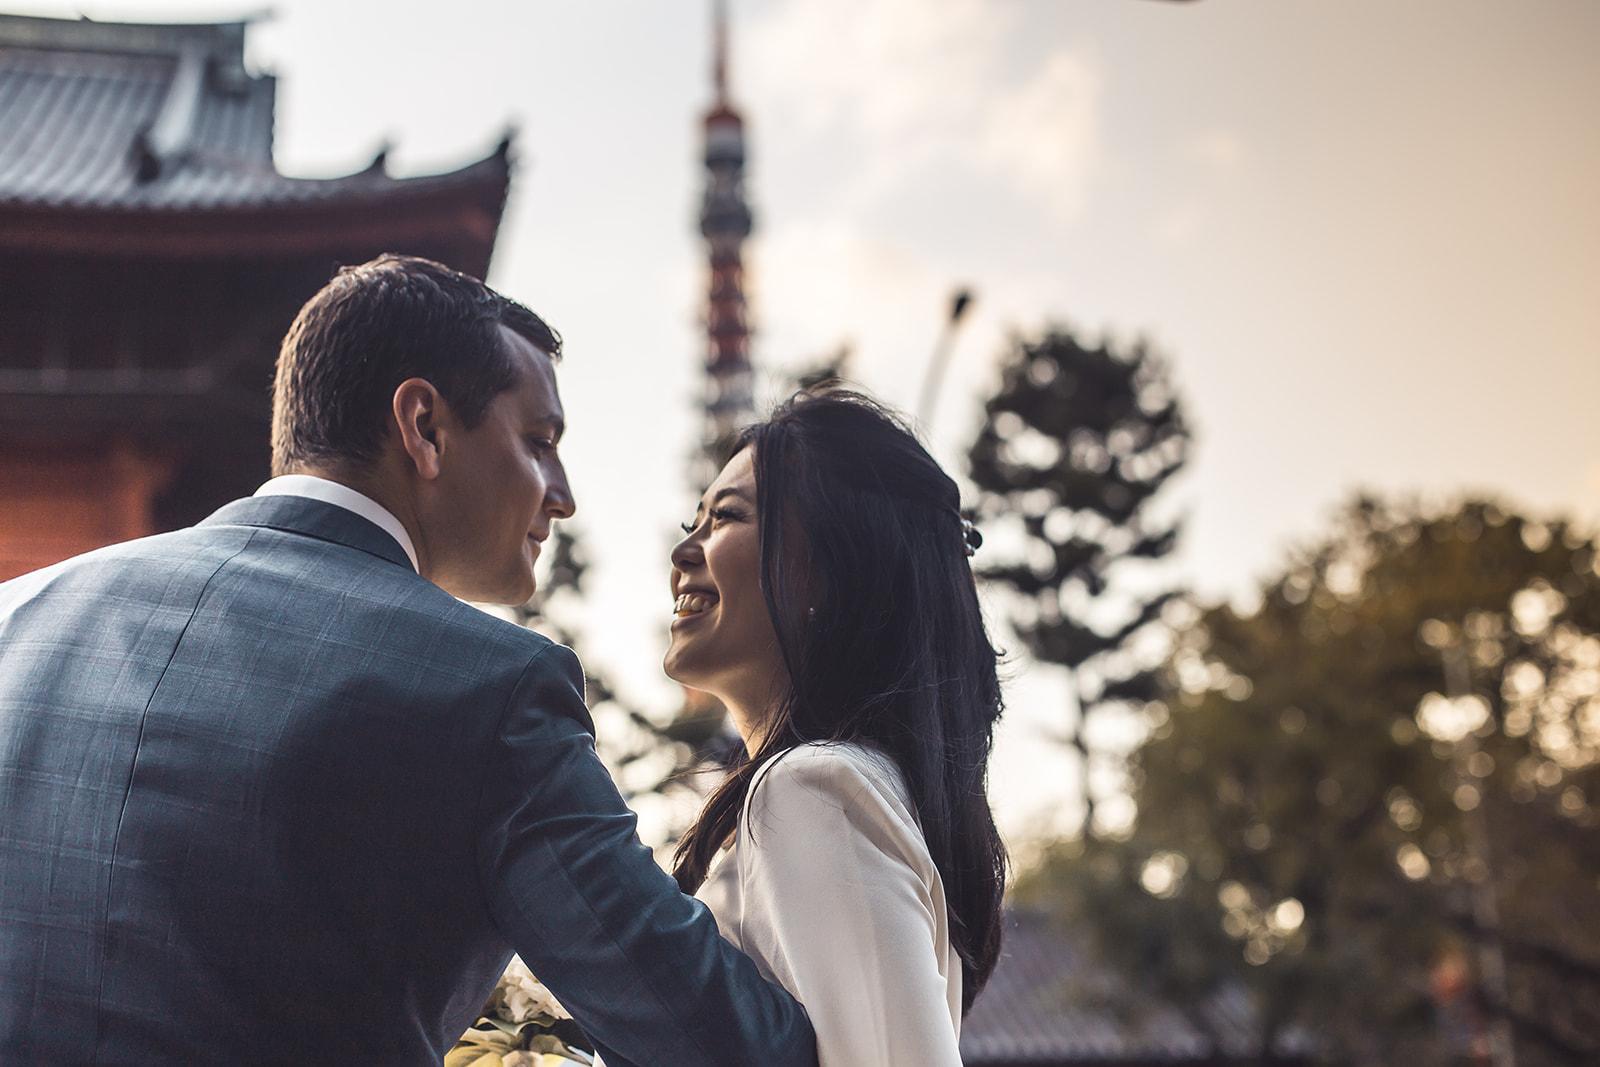 Prewedding pre wedding engagement in Tokyo Japan hire photographer (1).jpg